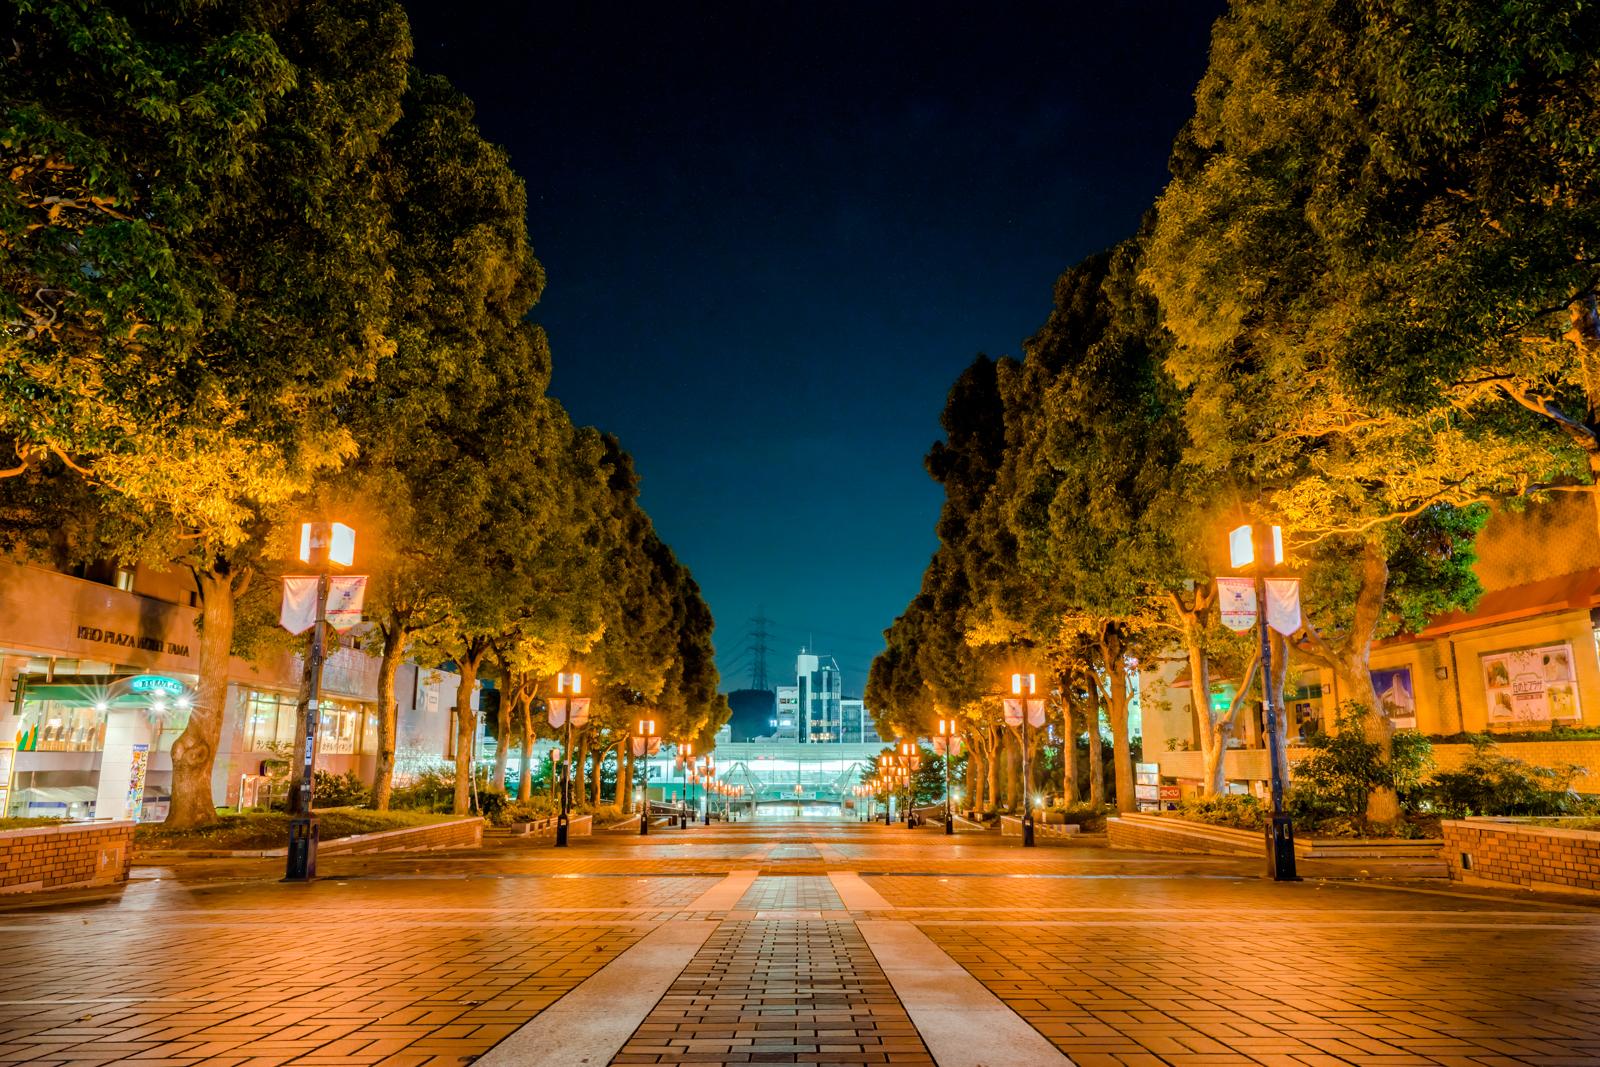 京王・小田急多摩センター駅南口